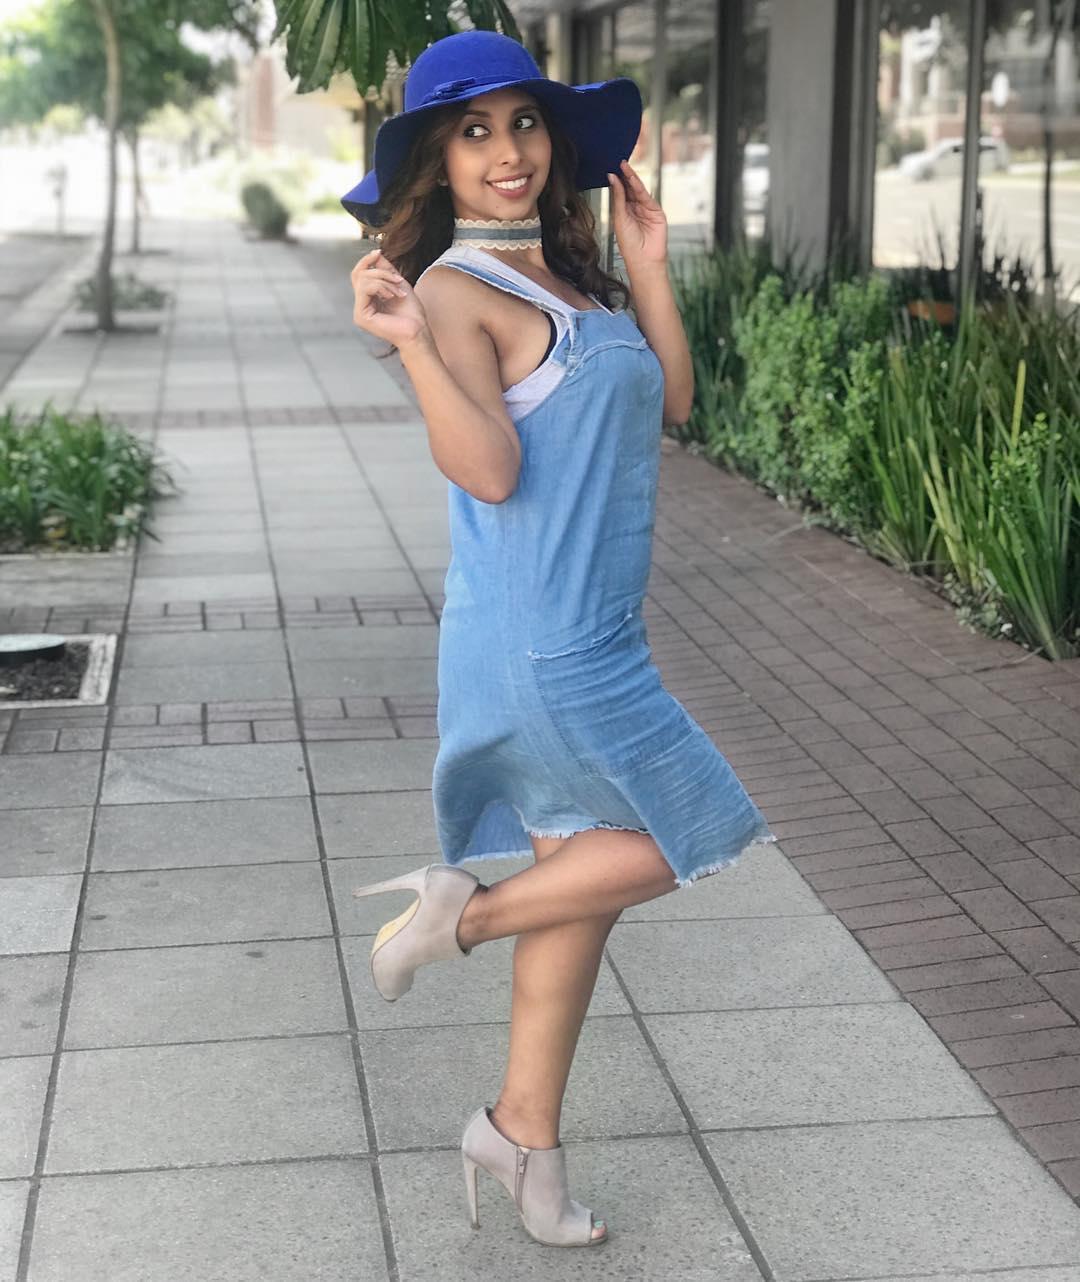 Pretty Street Style Denim Dress With High Heels